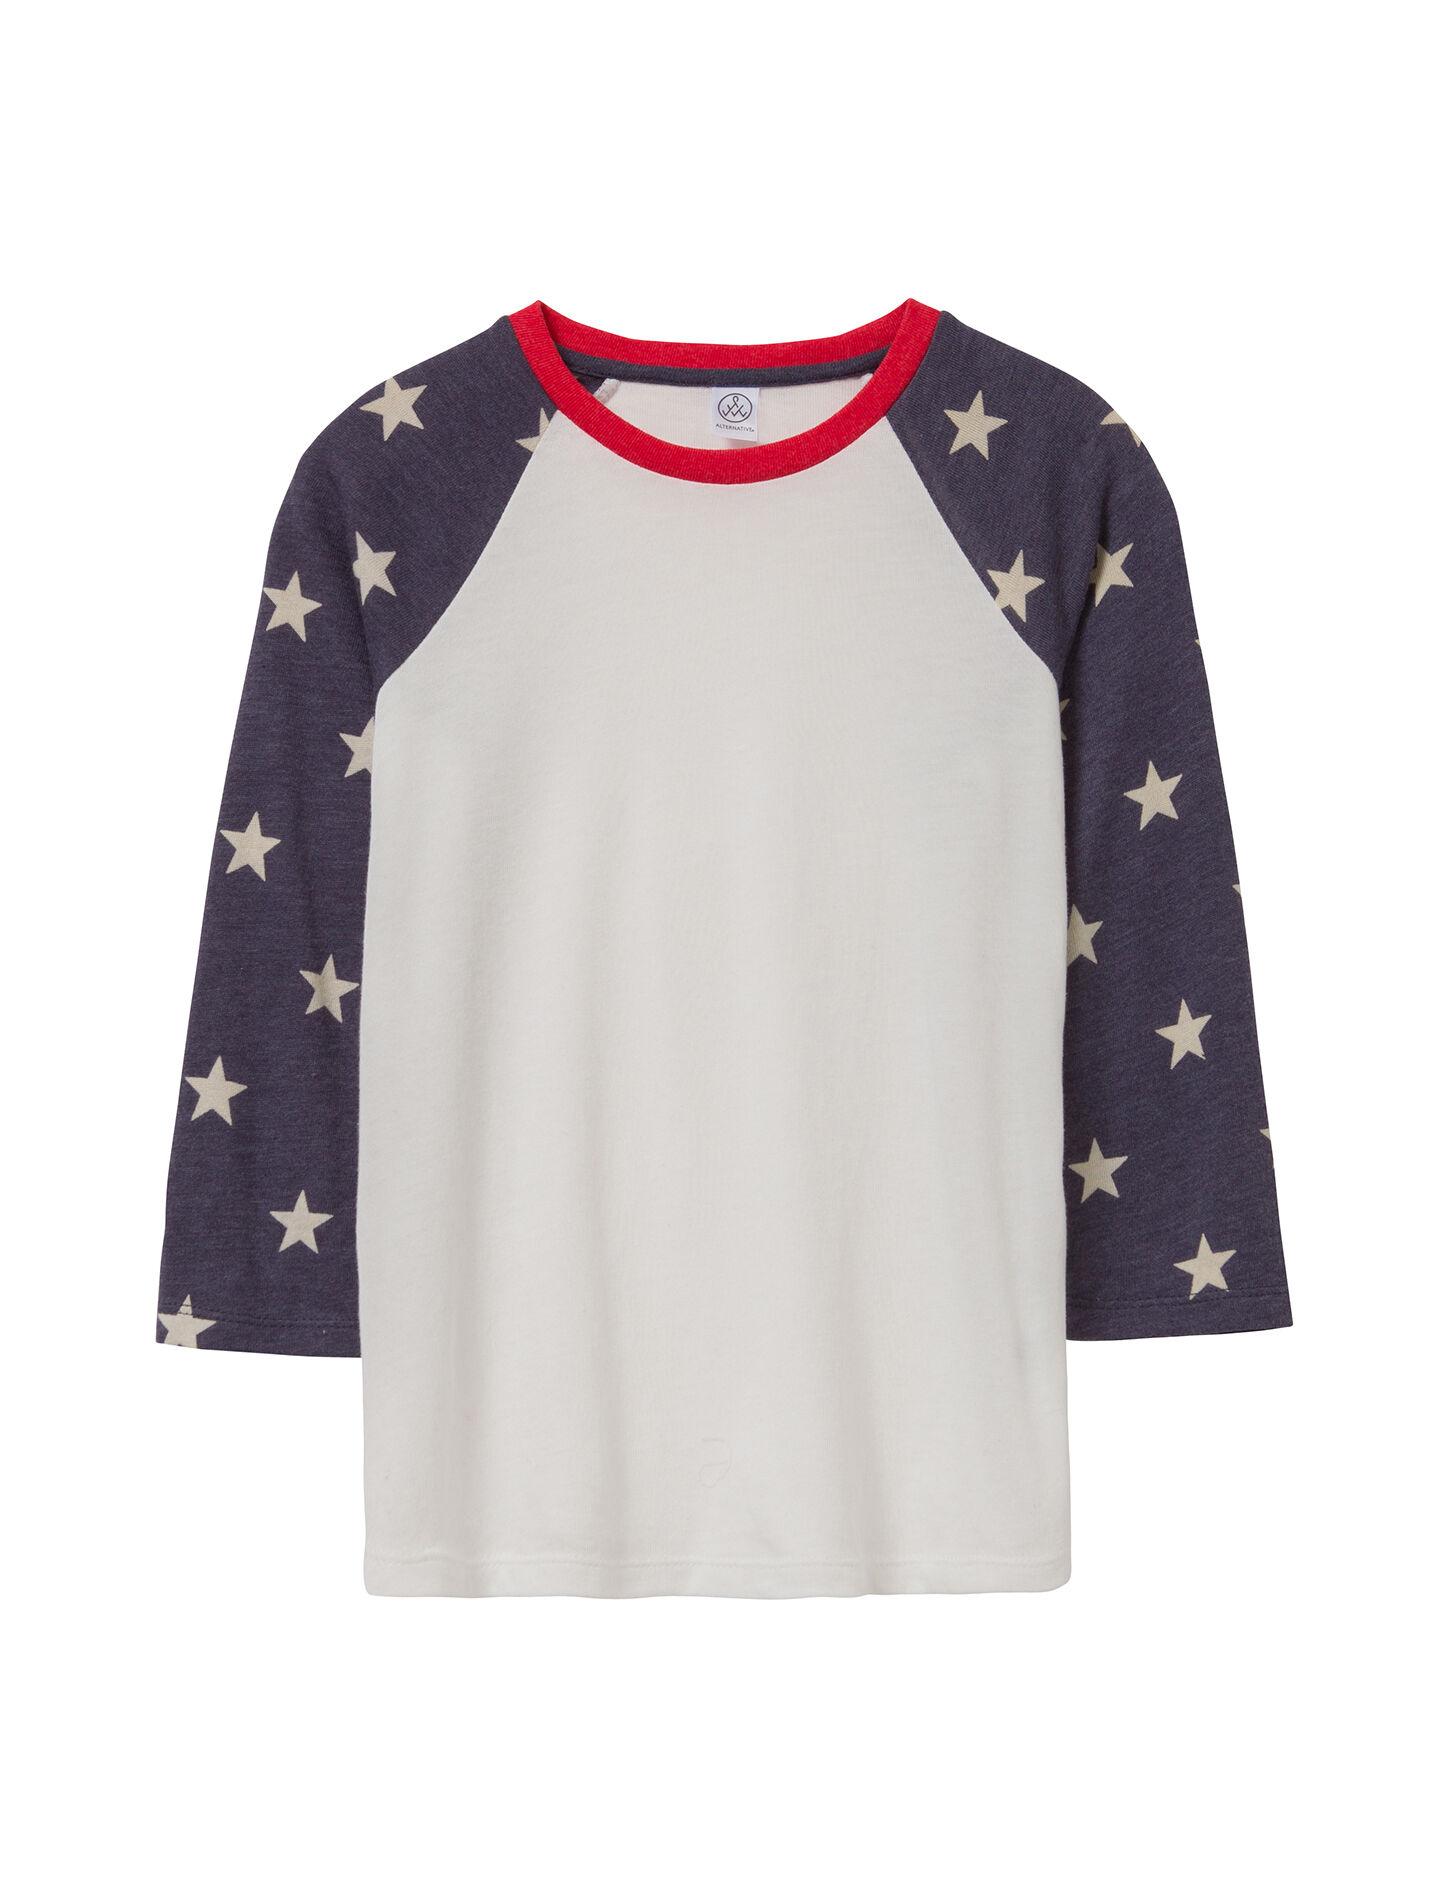 Alternative Apparel Baseball Printed Eco-Jersey Youth T-Shirt - Stars - Size: YS